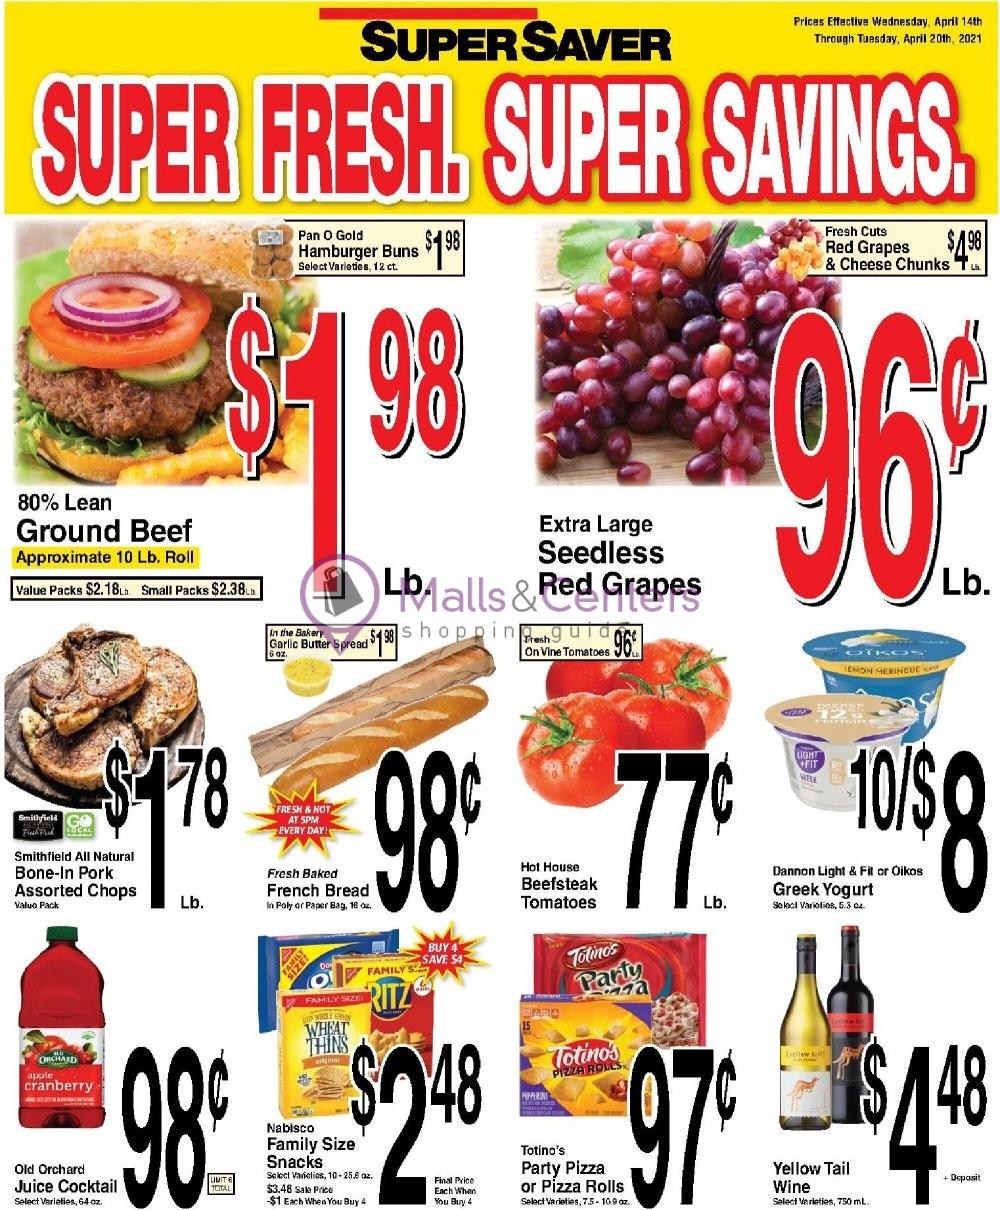 weekly ads Super Saver - page 1 - mallscenters.com